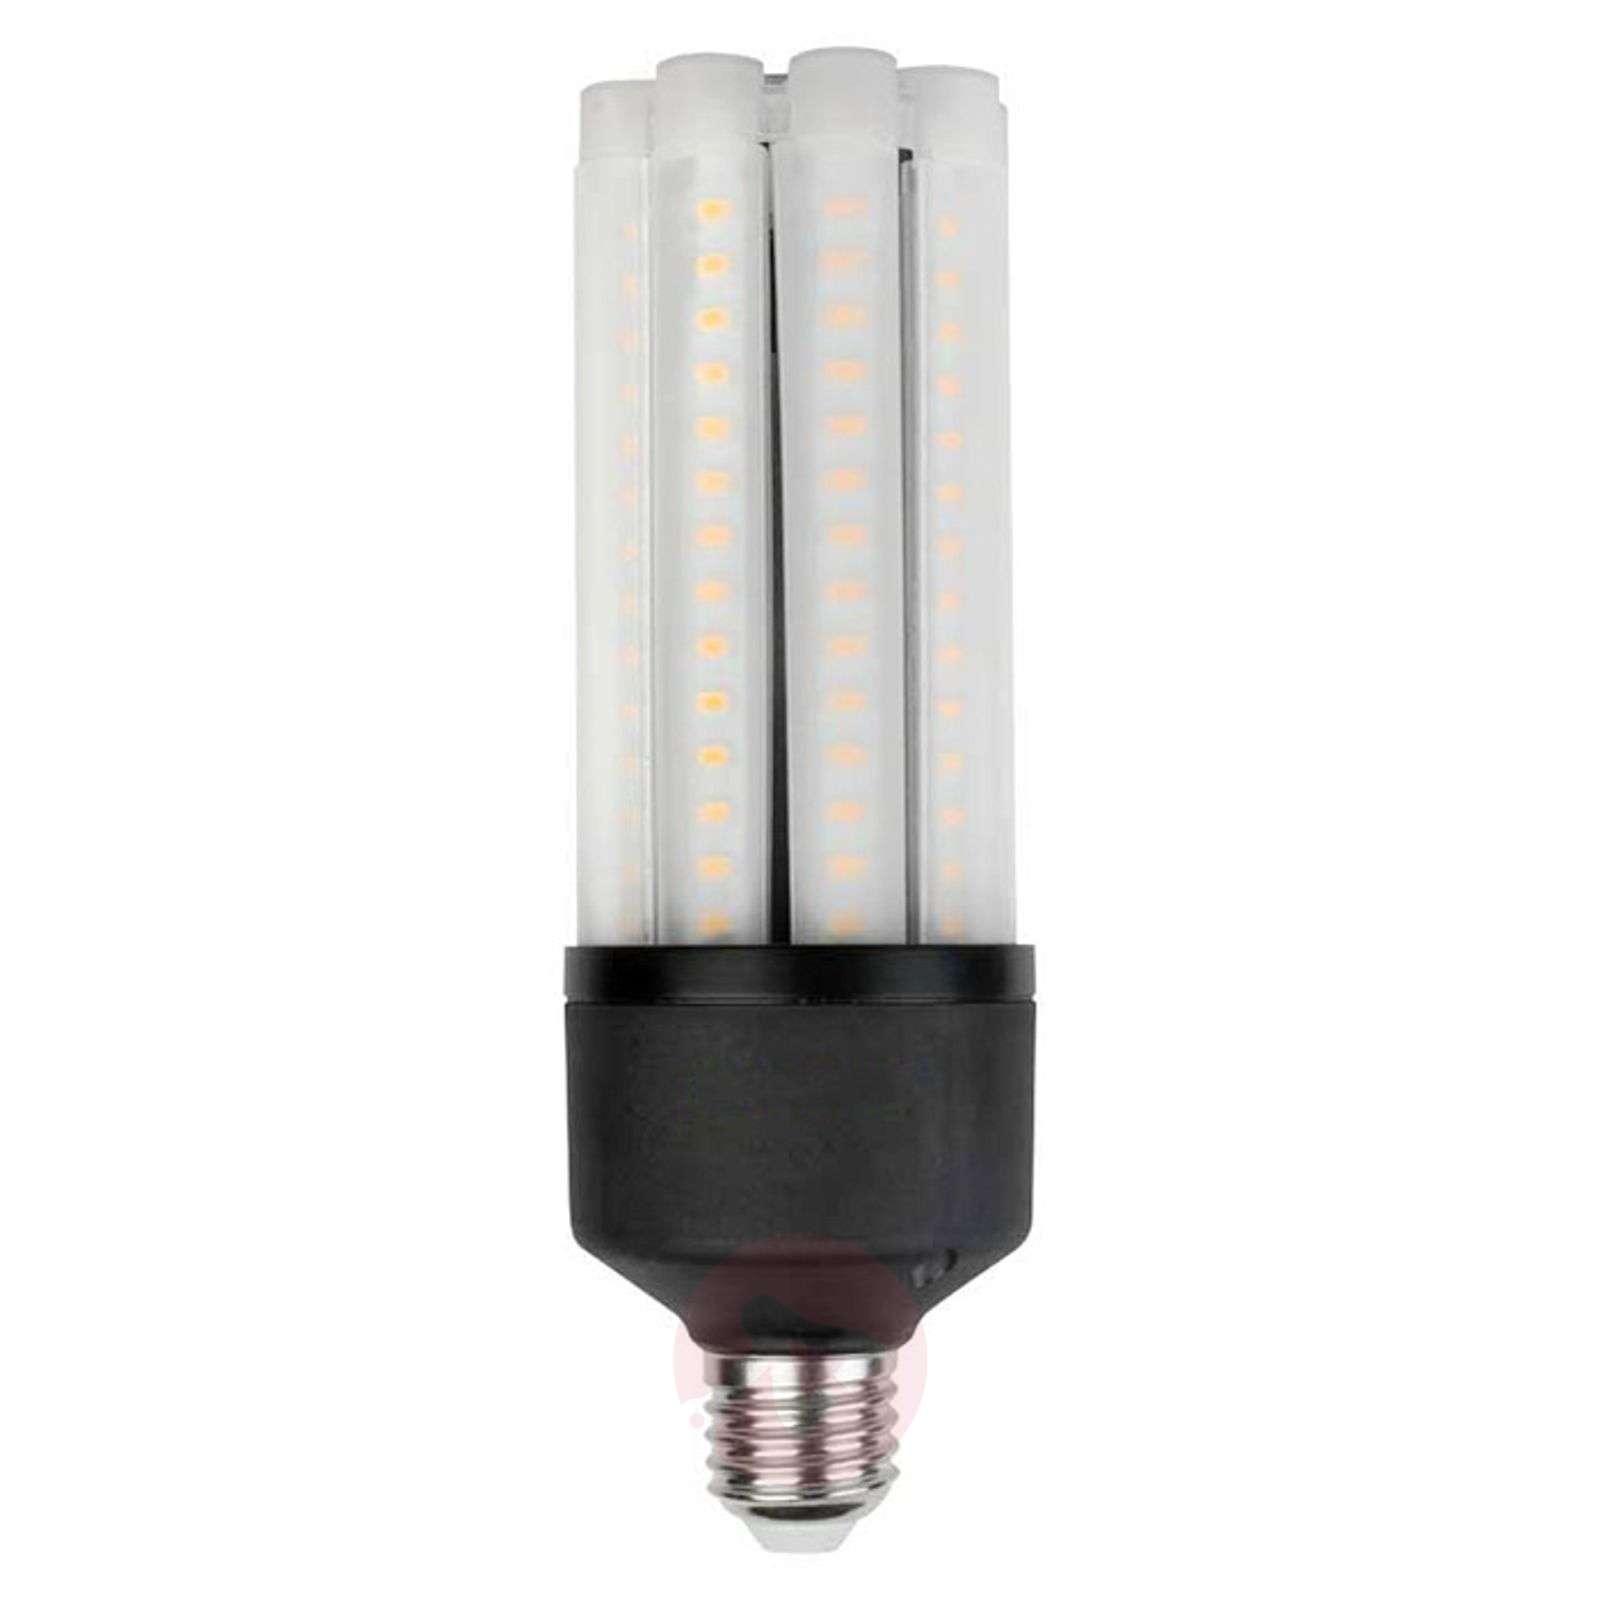 E27 35W LED clusterlite by MEGAMAN-6530193X-01